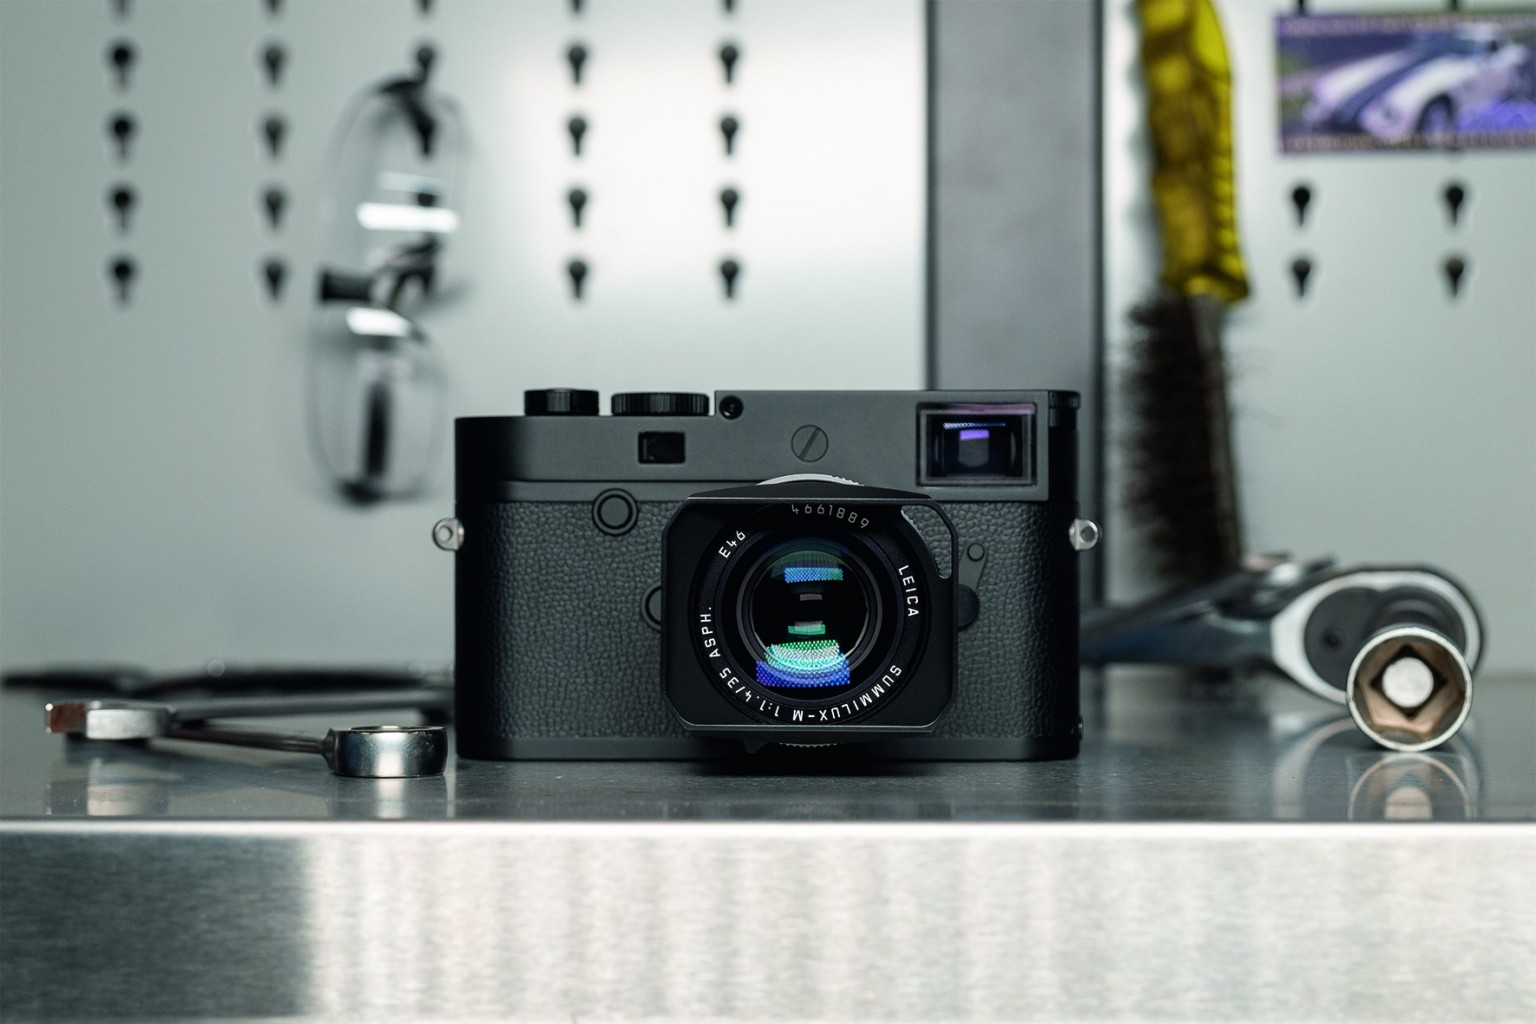 Leica M10 Monochrom sensor measurements and comparisons